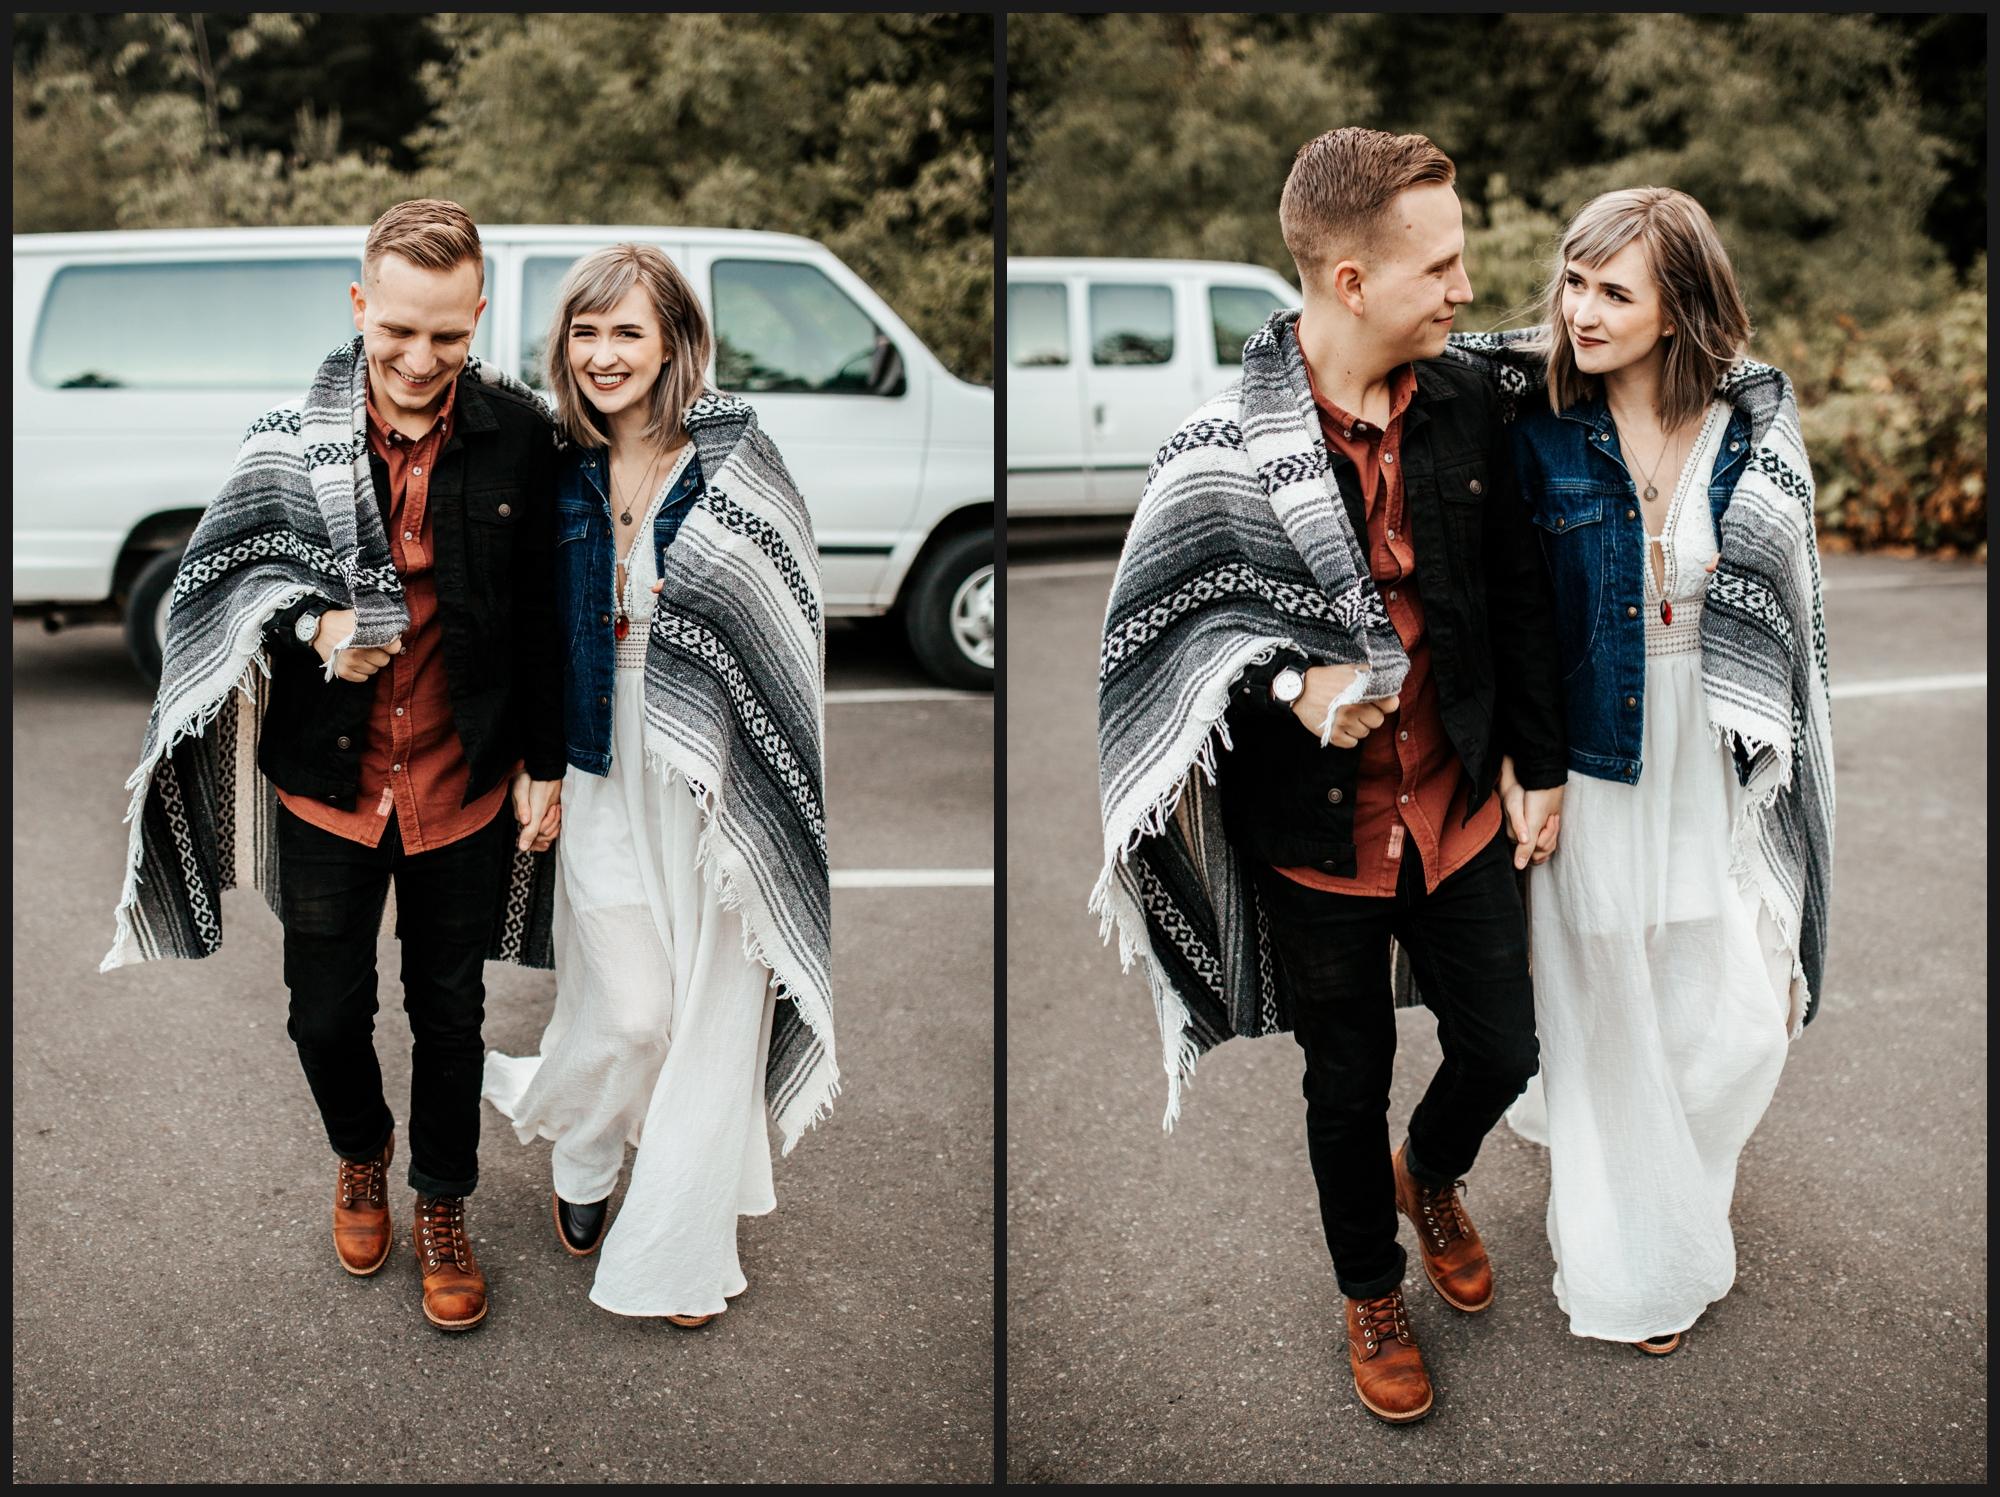 Orlando-Wedding-Photographer-destination-wedding-photographer-florida-wedding-photographer-bohemian-wedding-photographer_0385.jpg